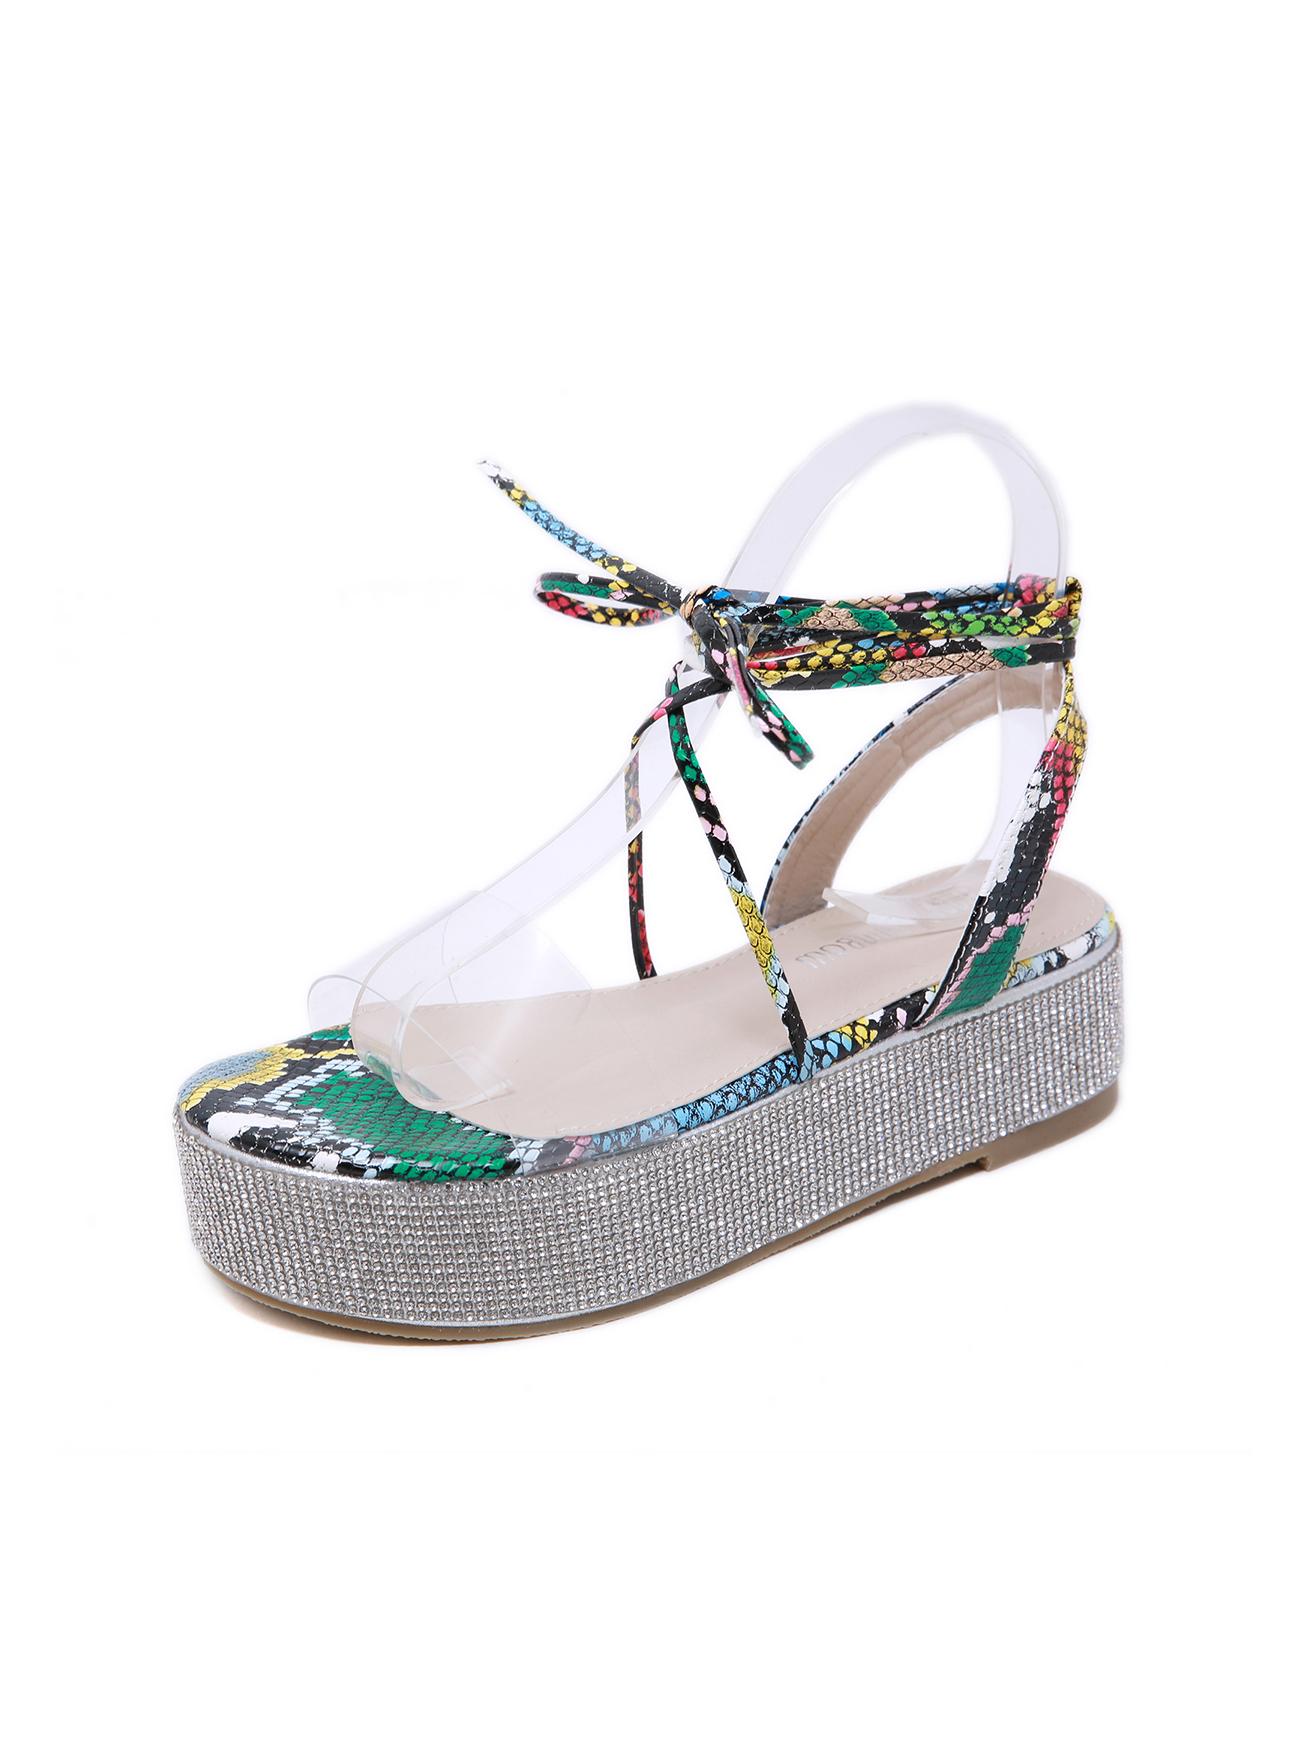 High Platform Lace Up Rhinestone Decor Ladies Sandals